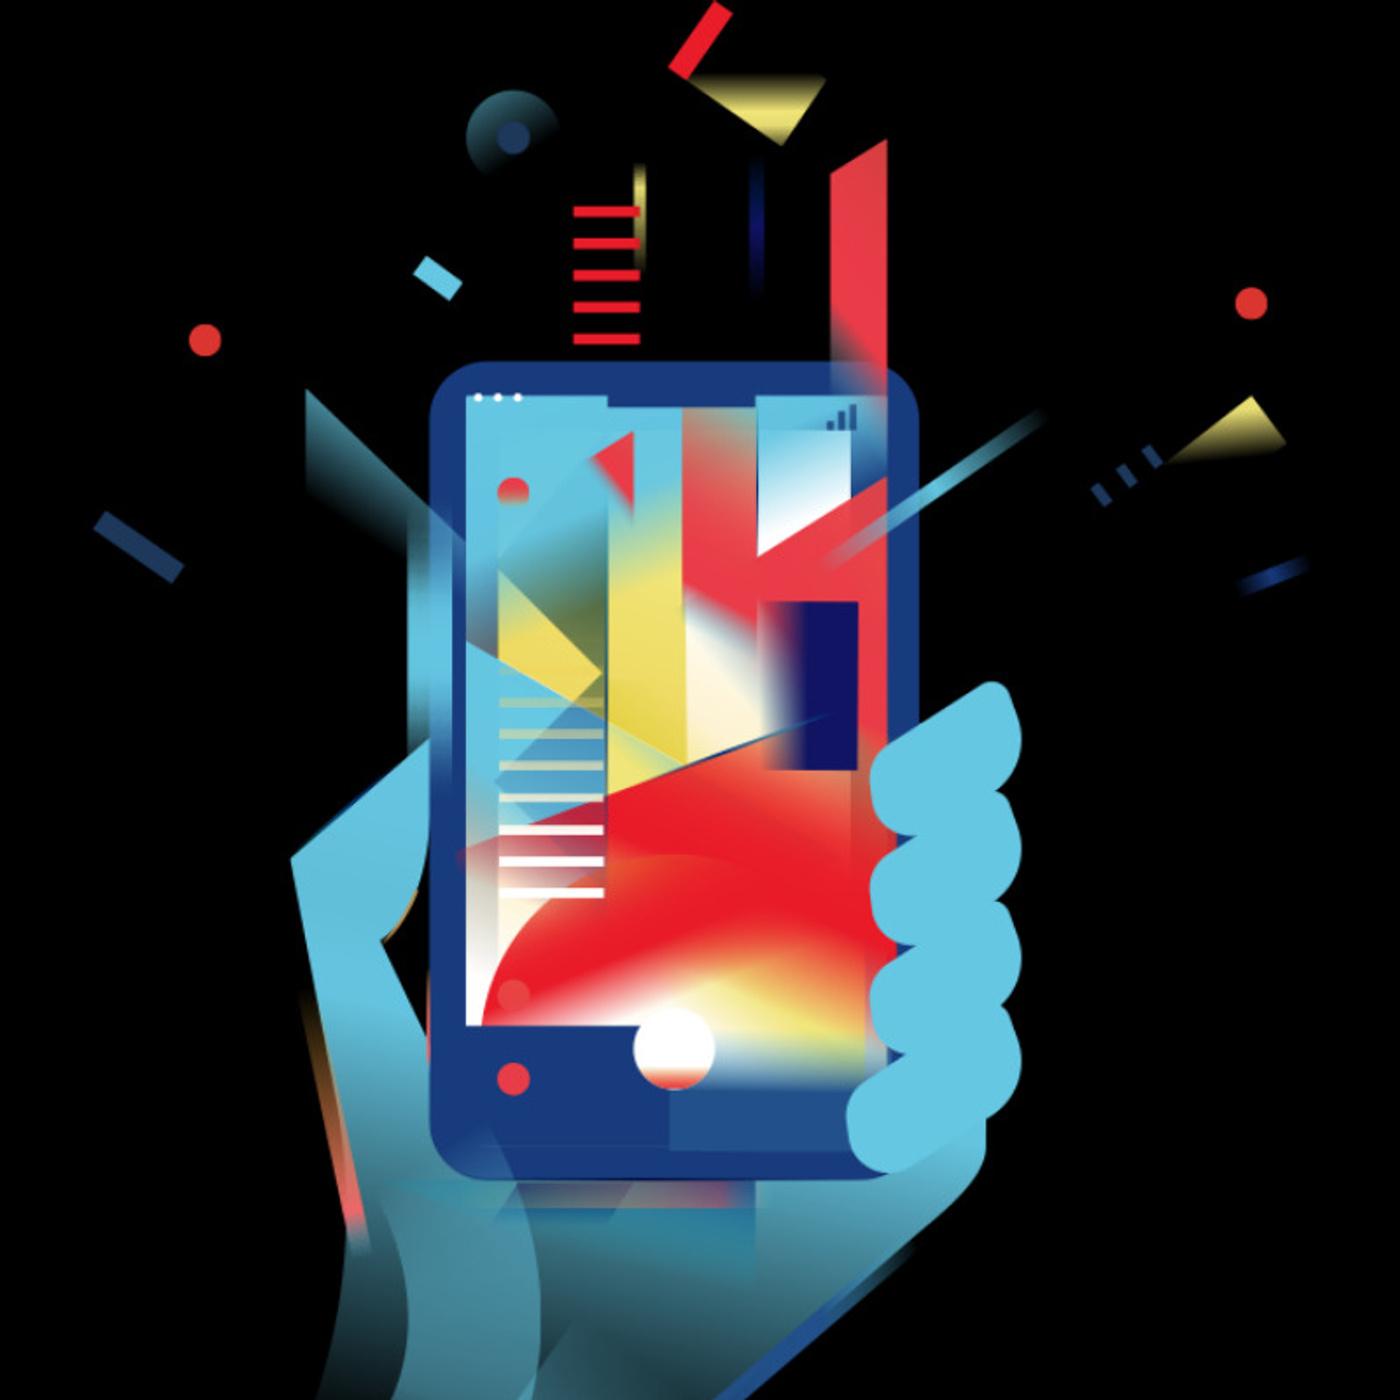 Defending Digital Rights - Rebecca MacKinnon & Molly Roberts